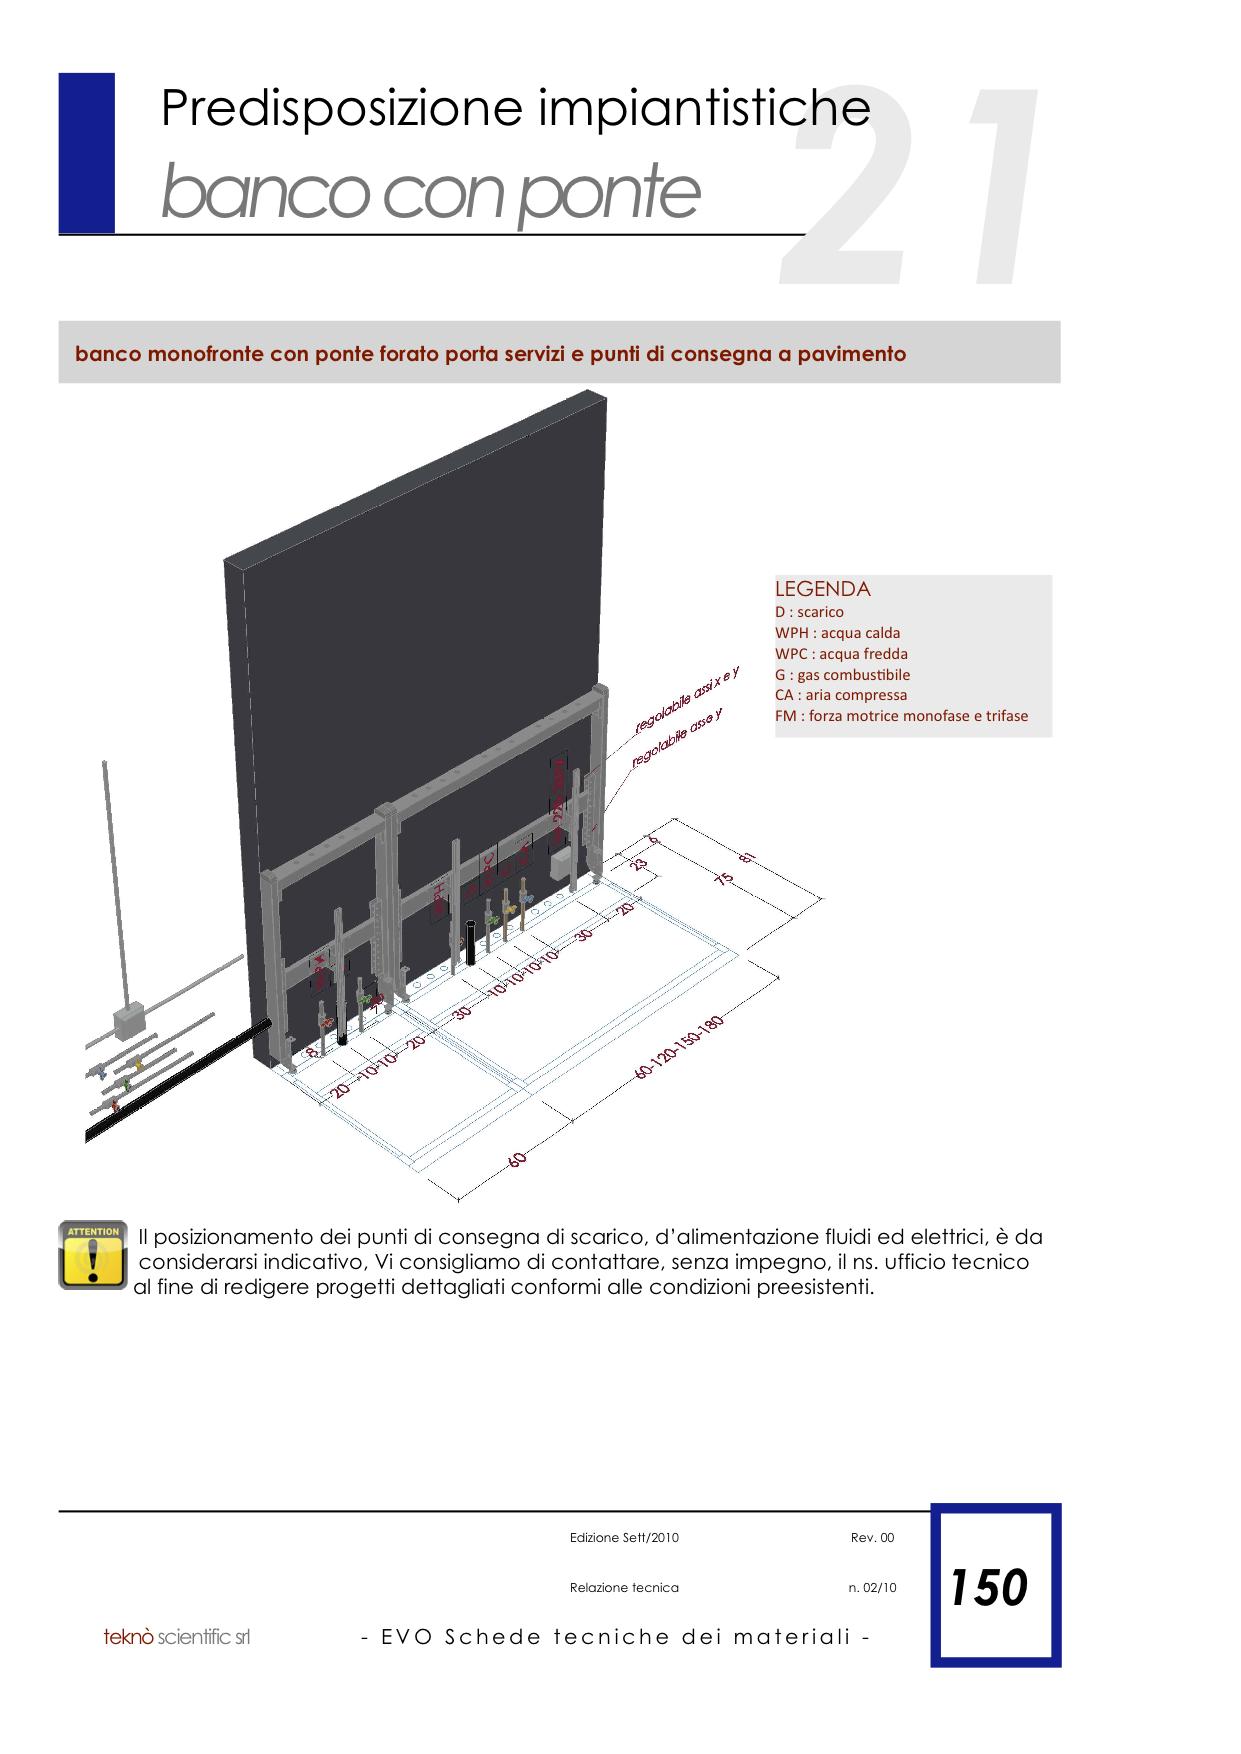 EVO Schede Tecniche materiali copia 10.png